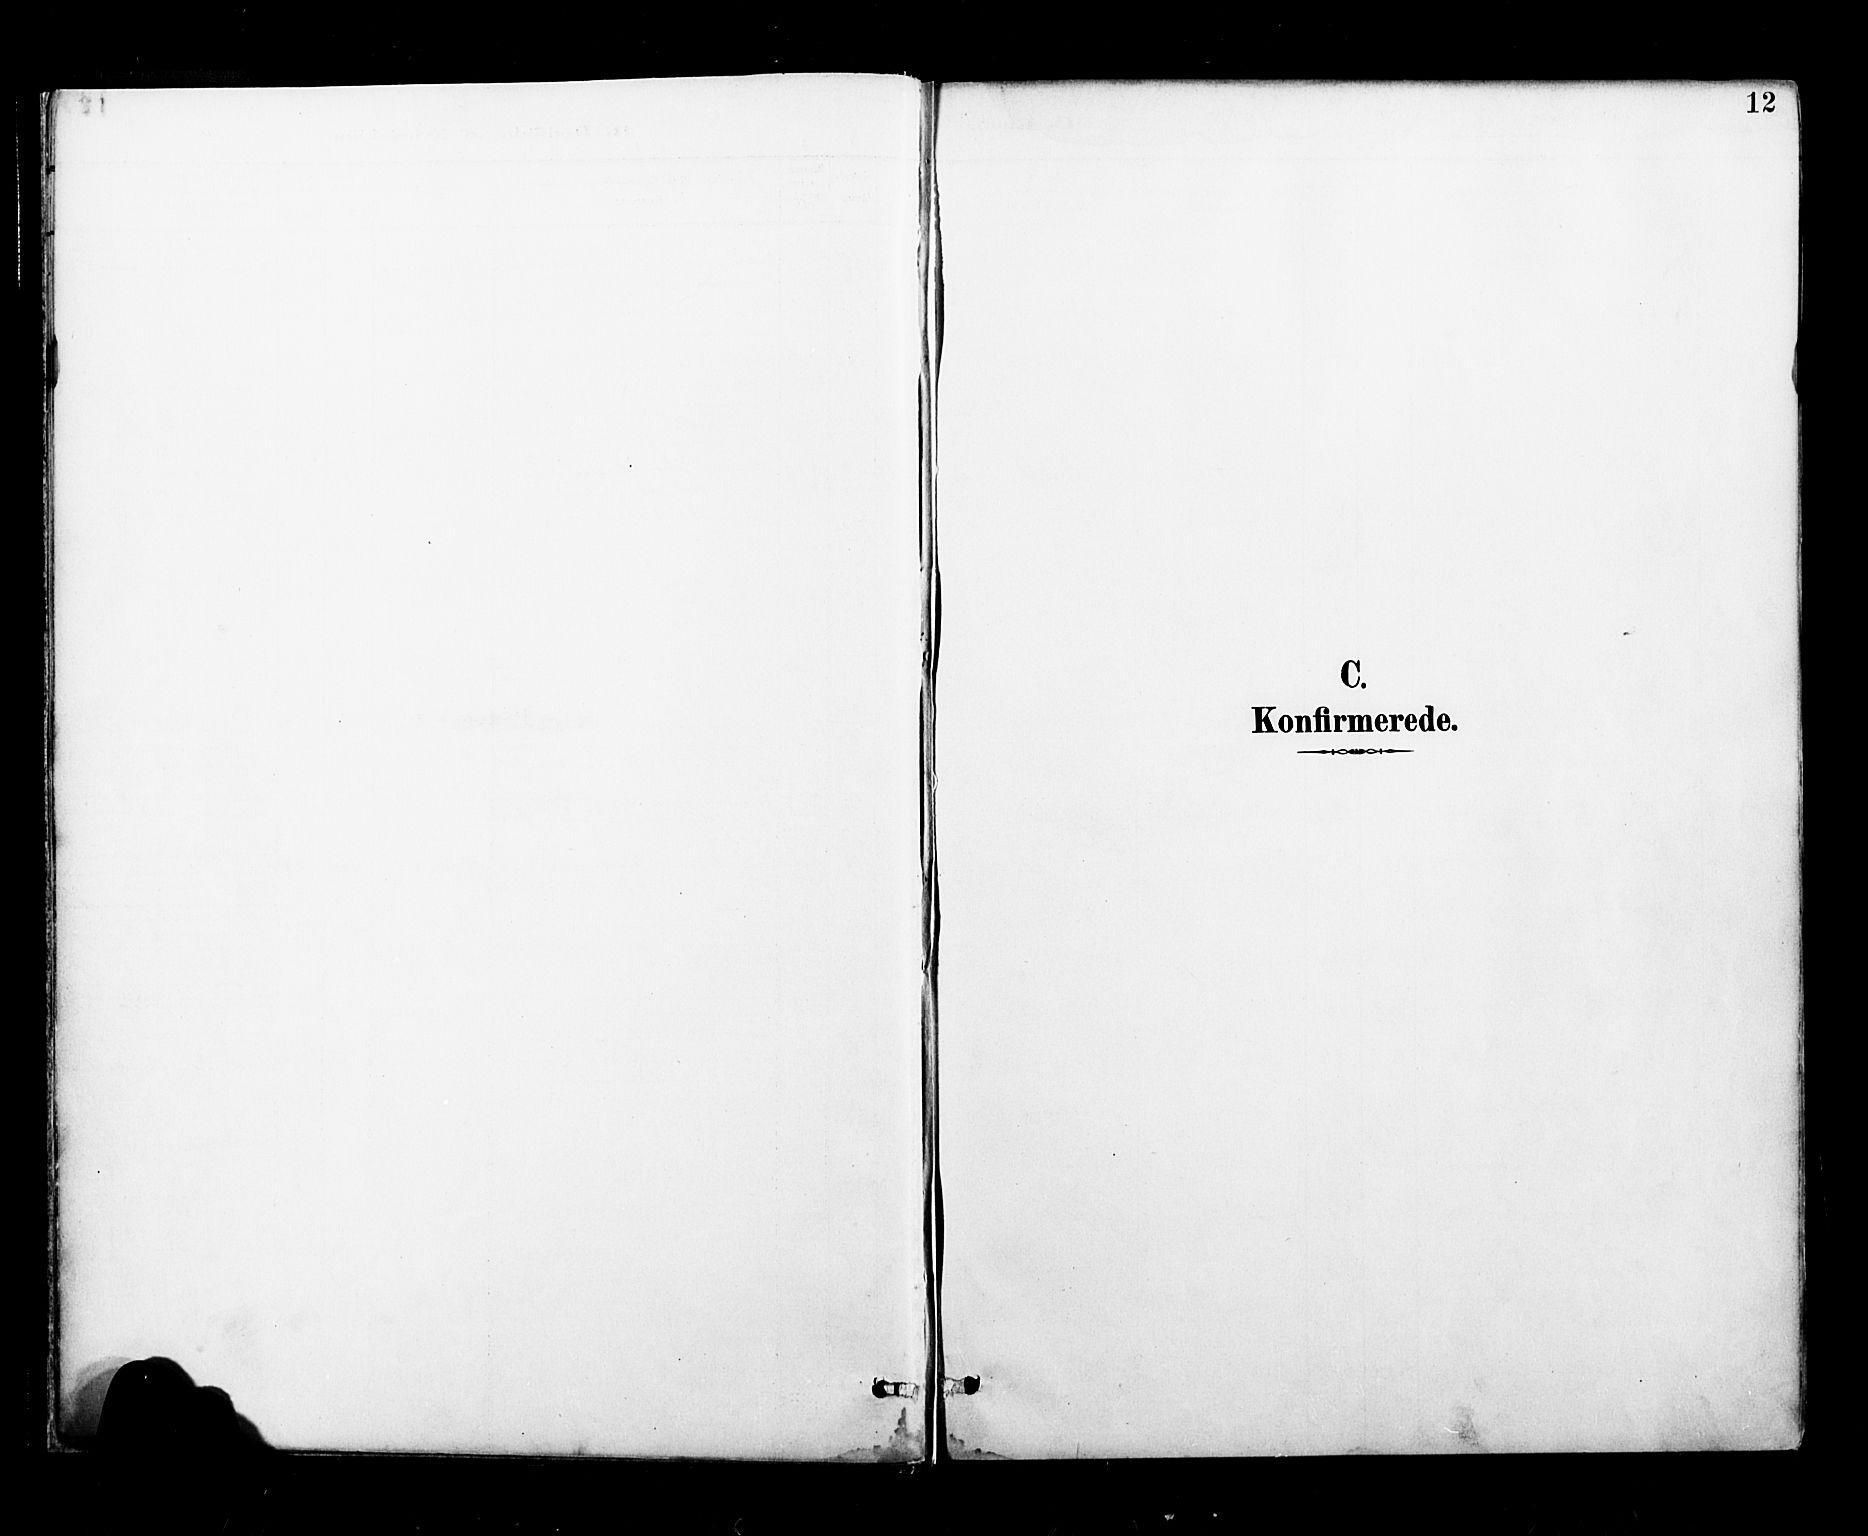 SAT, Ministerialprotokoller, klokkerbøker og fødselsregistre - Nordland, 827/L0401: Ministerialbok nr. 827A13, 1887-1905, s. 12